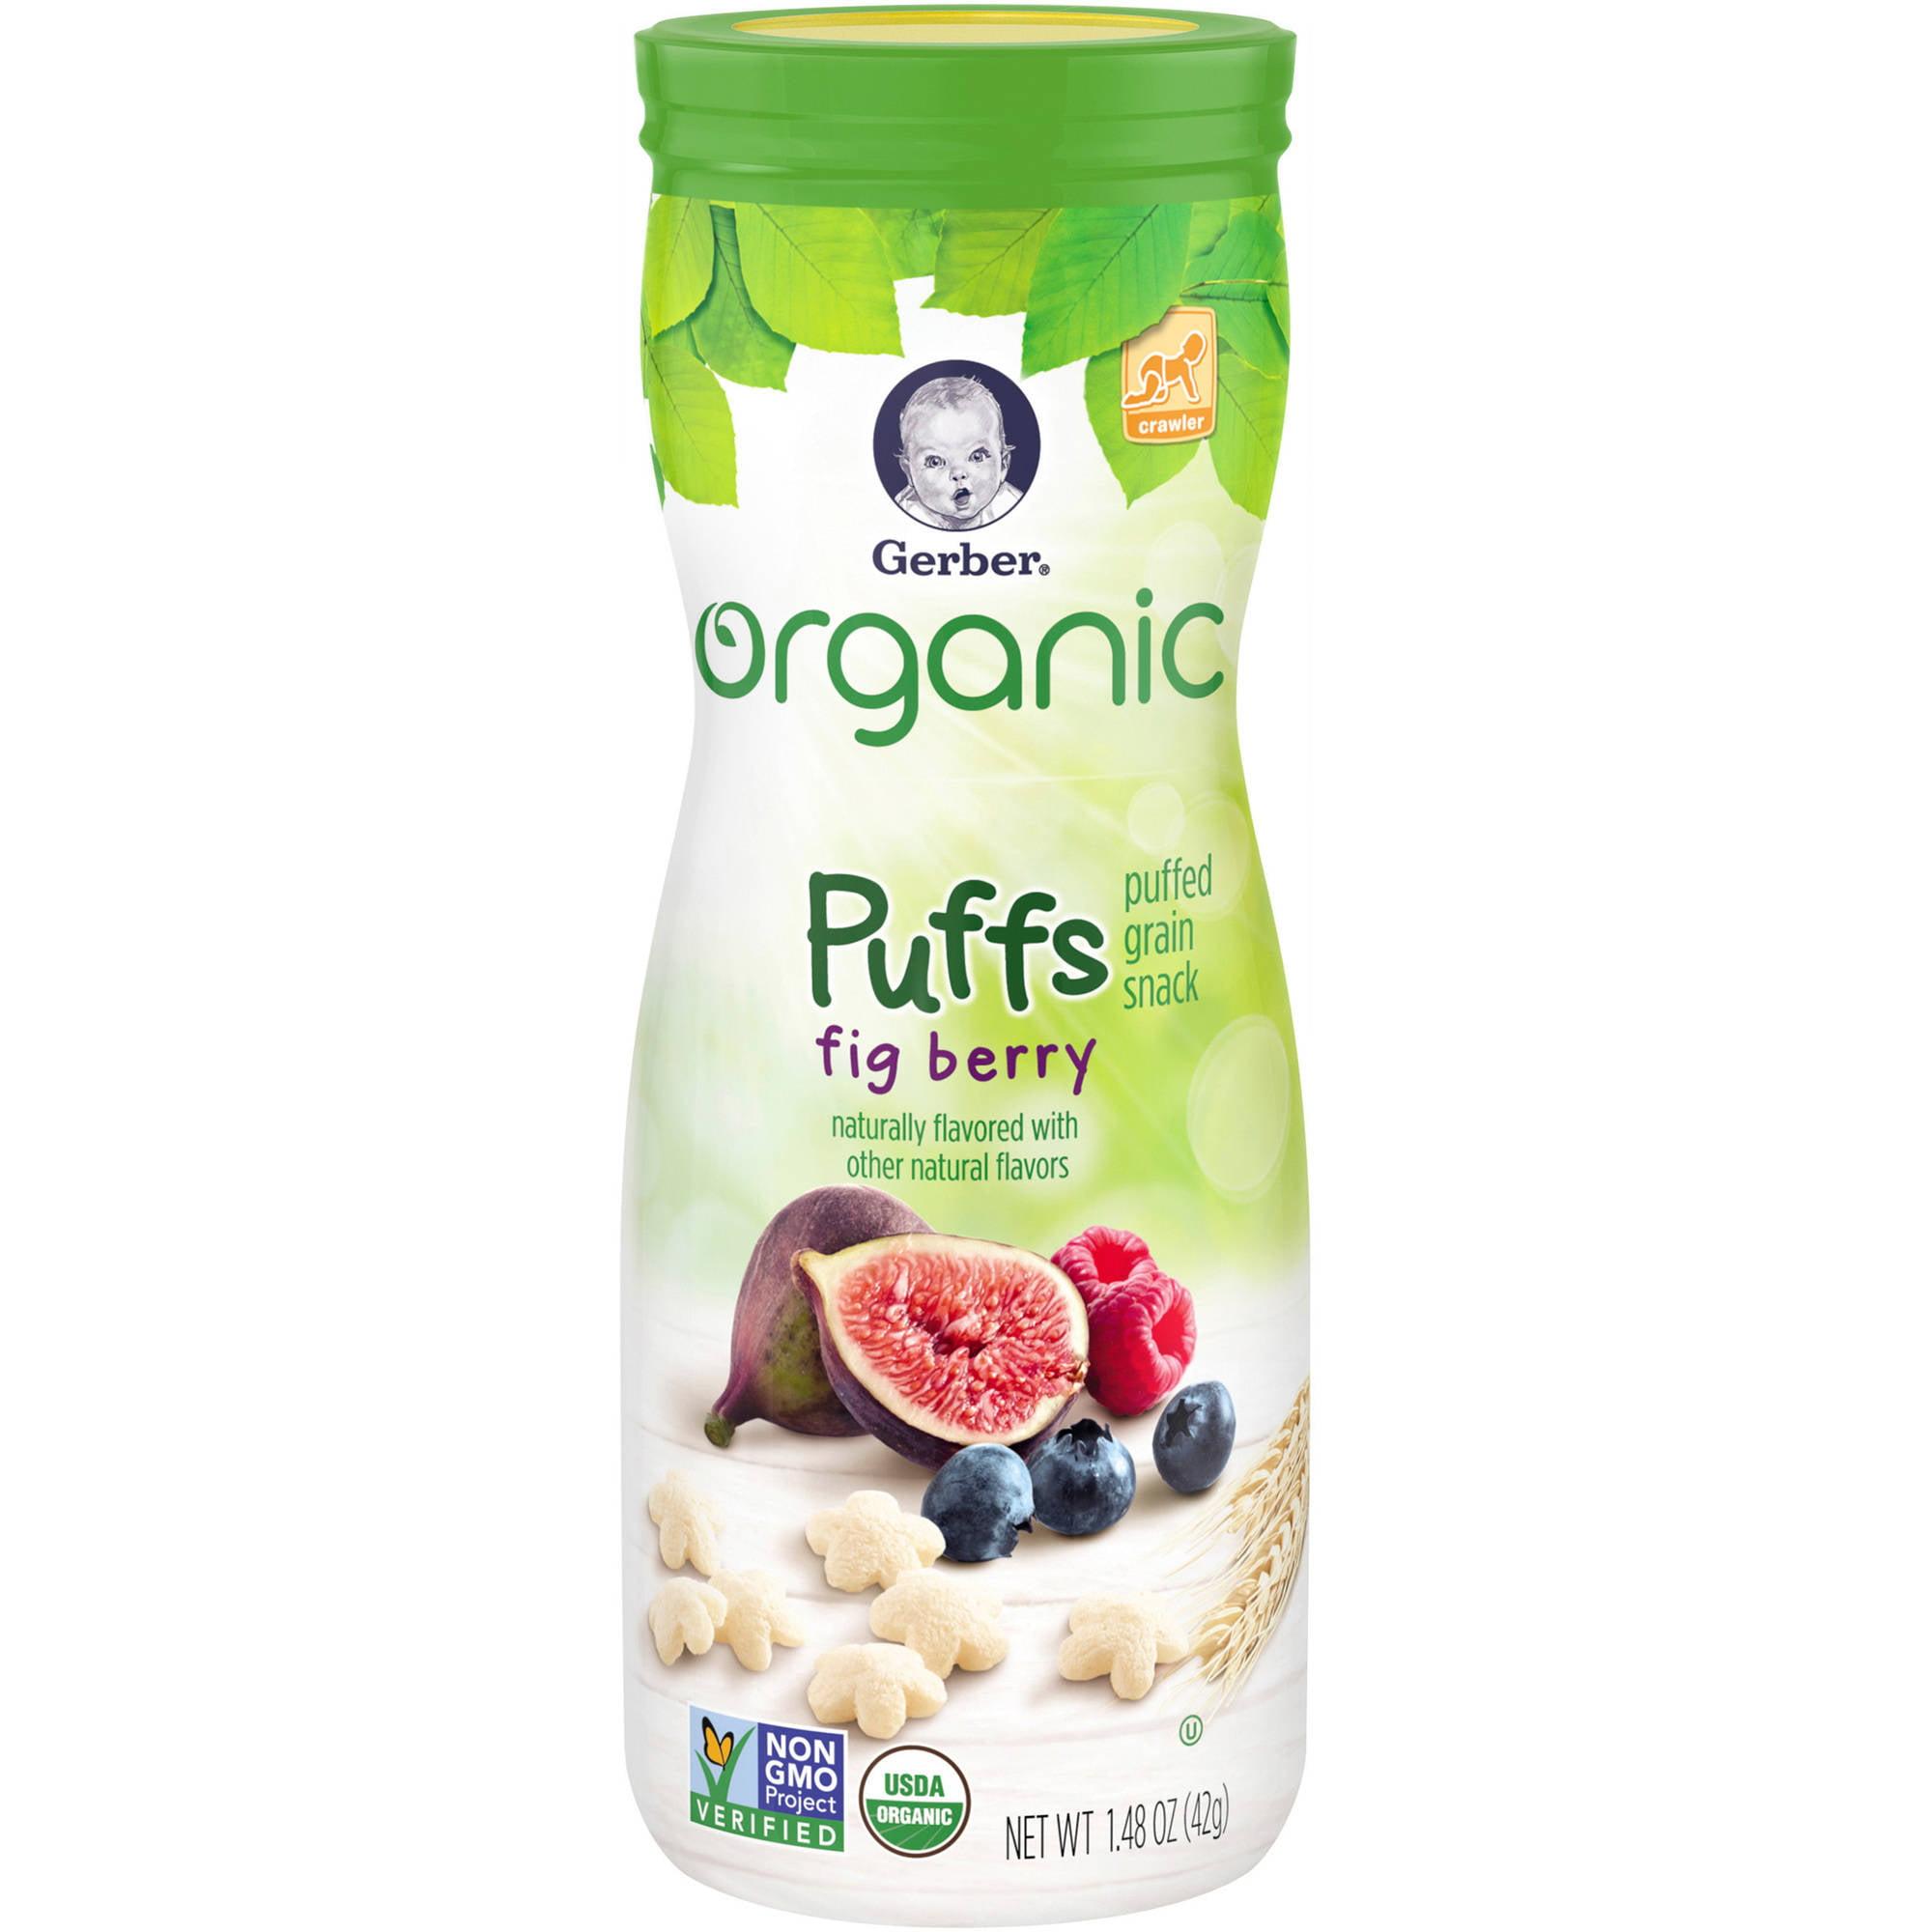 Gerber Organic Puffs Fig Berry Puffed Grain Snack, 1.48 oz by Gerber